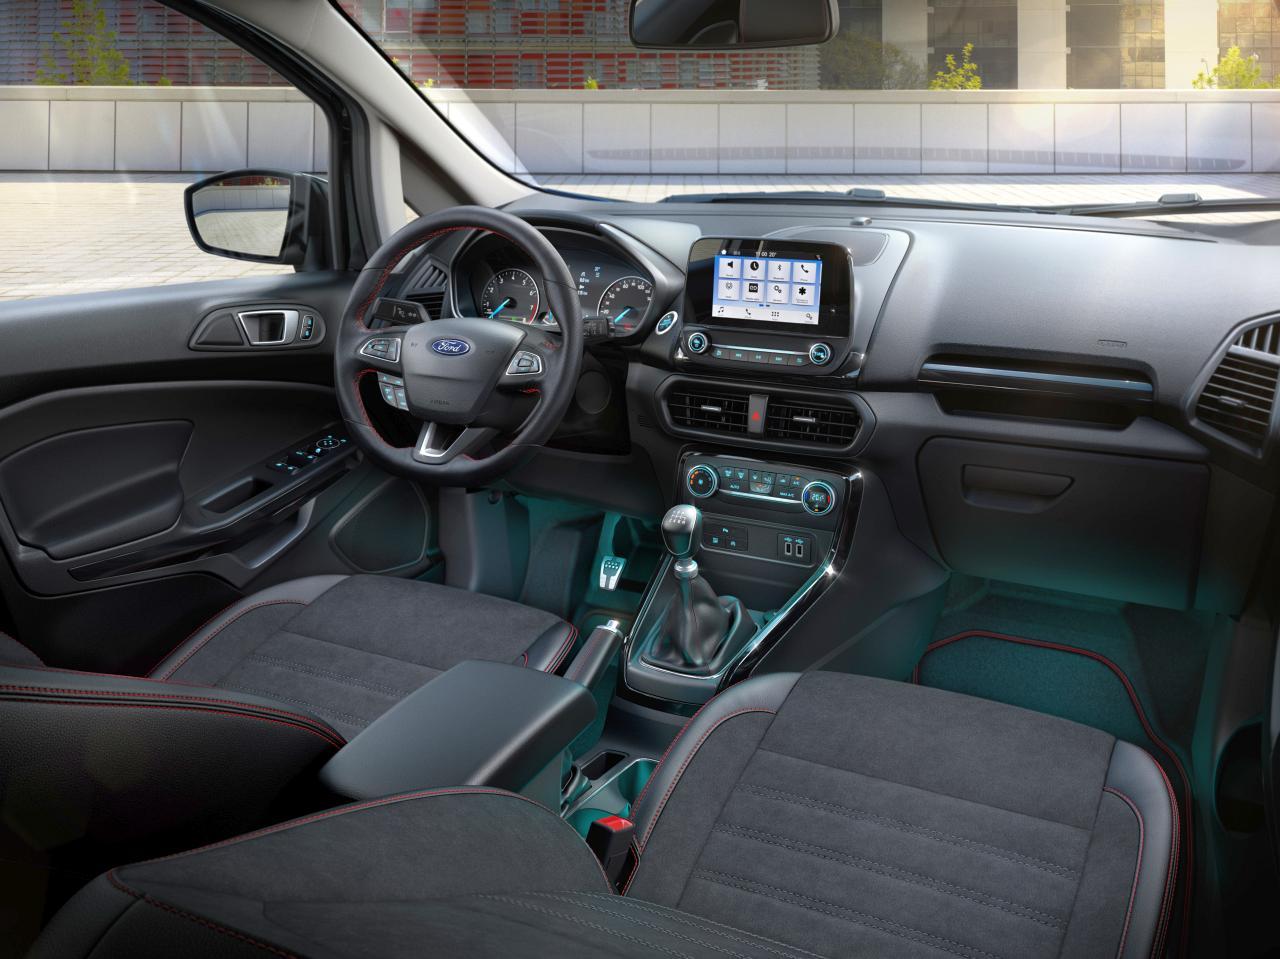 Ford-Hagemeier-EcoSport-12